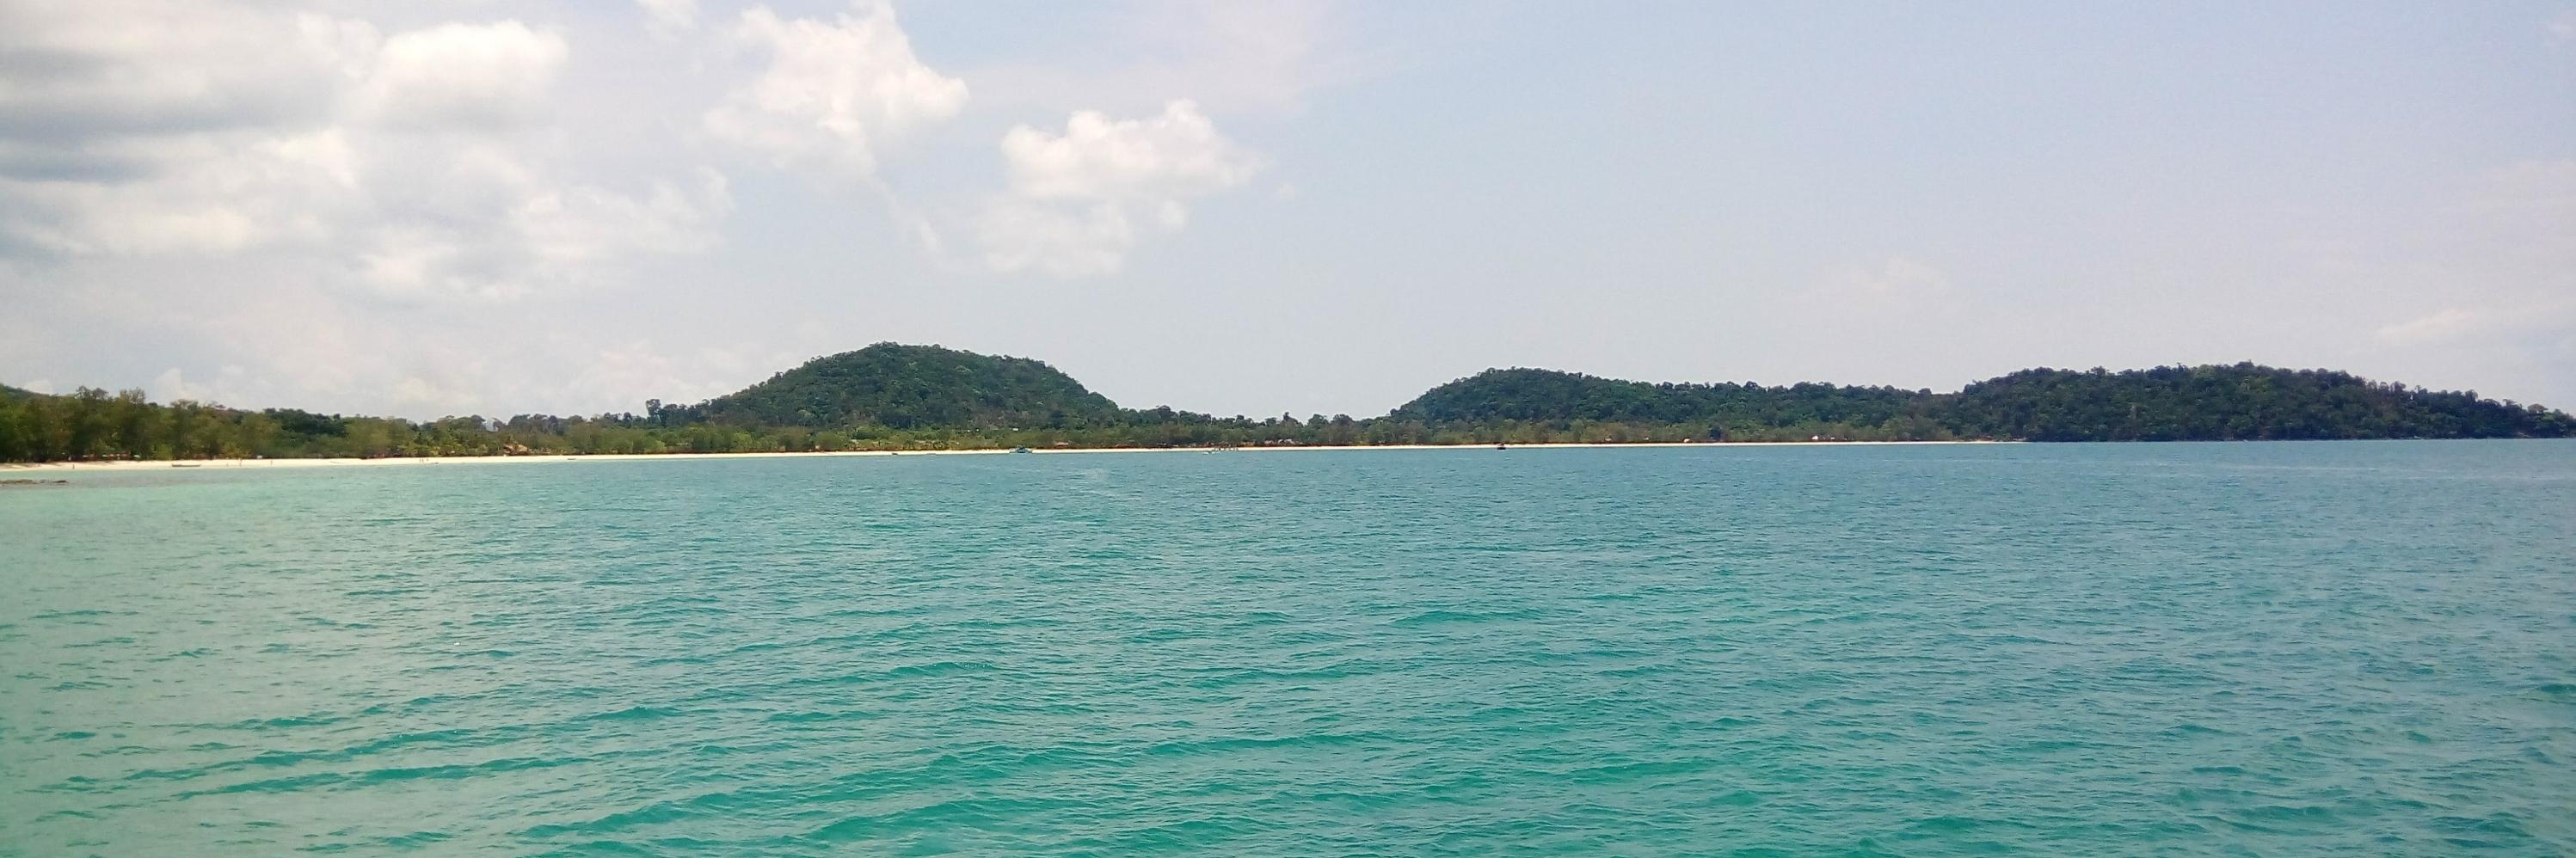 https://gody.vn/blog/khayenphuong2078/post/trai-nghiem-xe-may-den-shihaoukvilledao-kohrong-cao-nguyen-bokor-campuchia-chi-voi-50usd-528